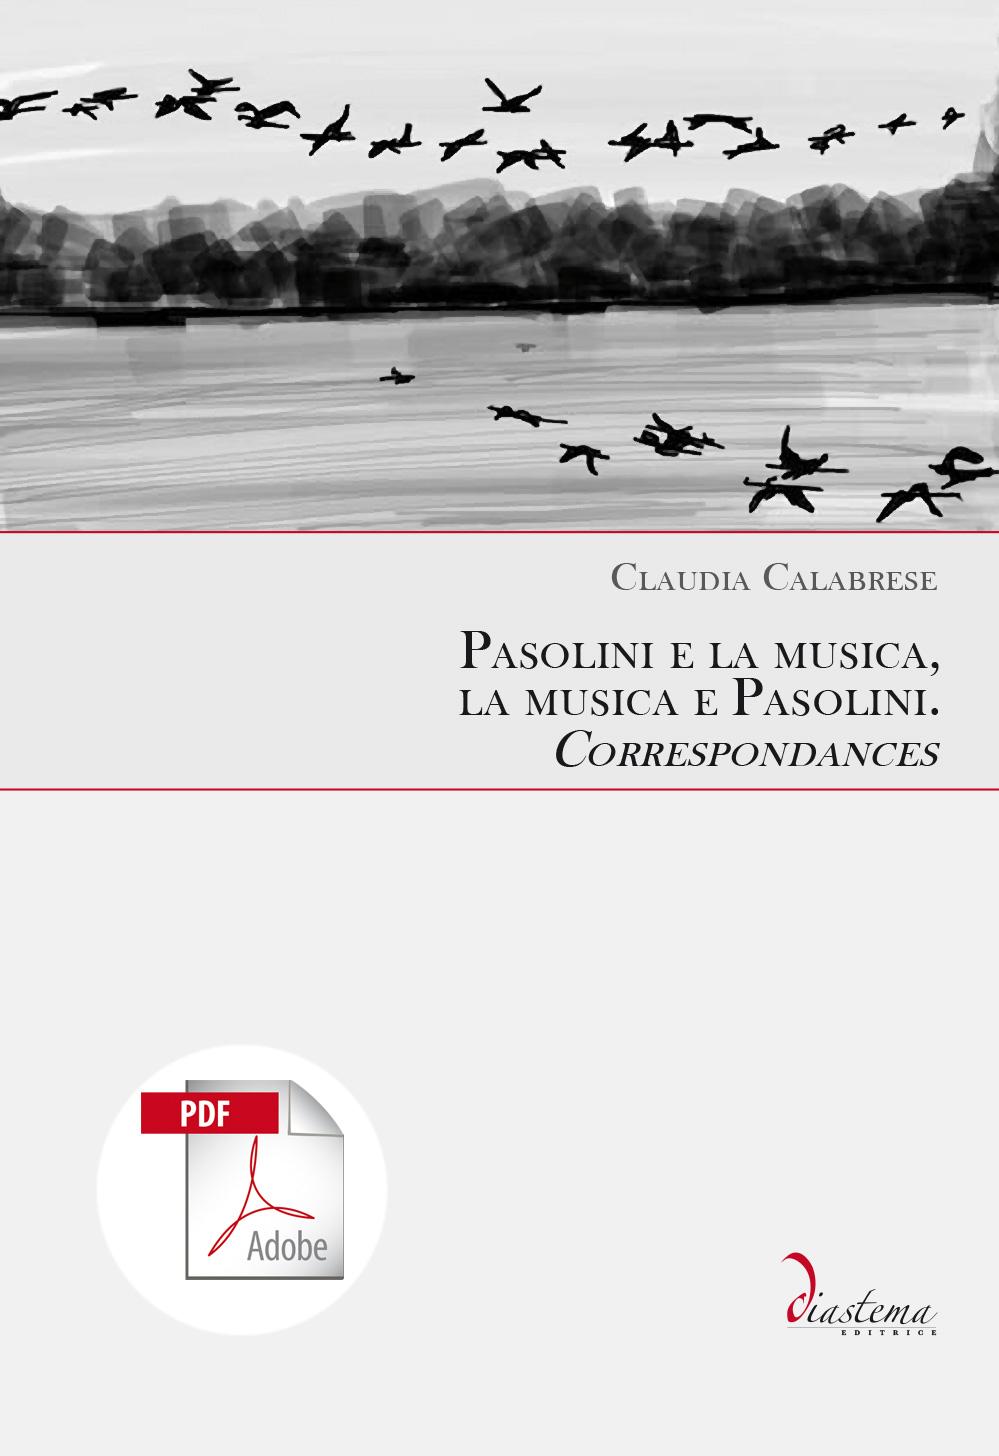 "Claudia Calabrese<p><span style=""color: #b21827;""><strong> Pasolini e la musica, la musica e Pasolini. </strong><br>Correspondances<br><span style=""color: #000000;"">Prefazione di Stefano La Via</strong></p> </span><span style=""color: #000;""><br> </strong><span style=""color: #000000;"">formato PDF</span>"